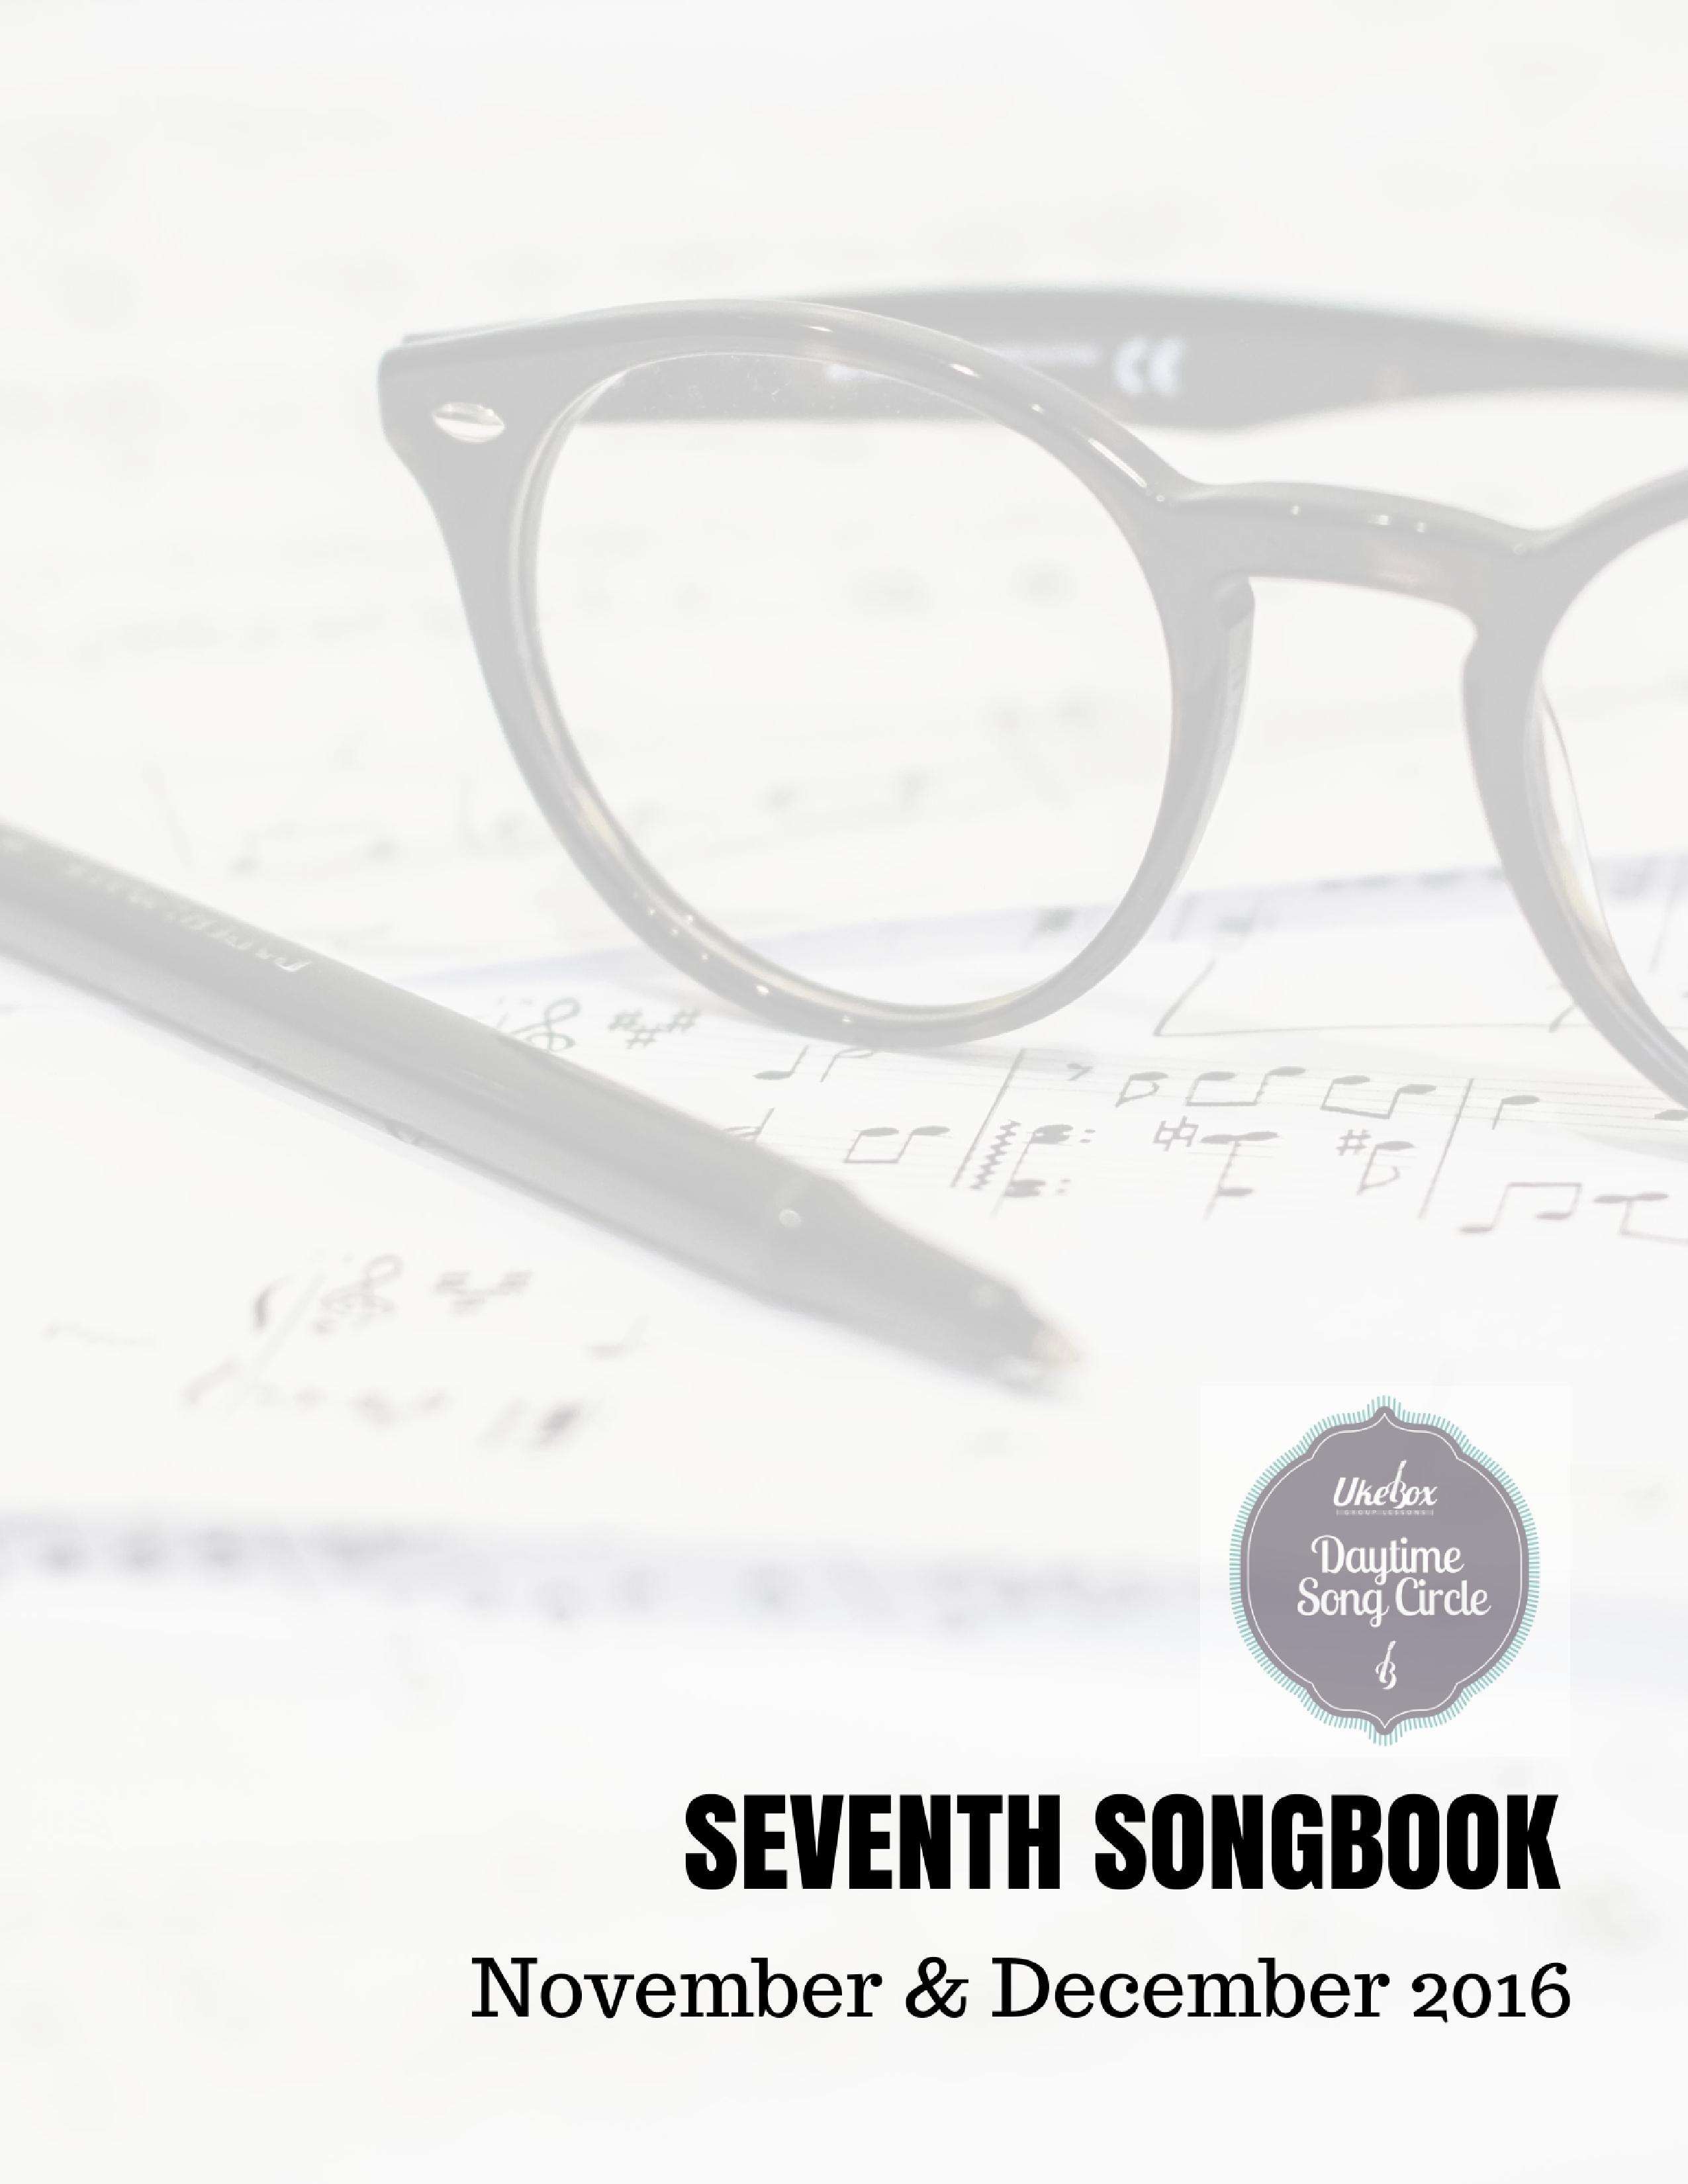 Songcircle Seventh Songbook Nov Dec 2016